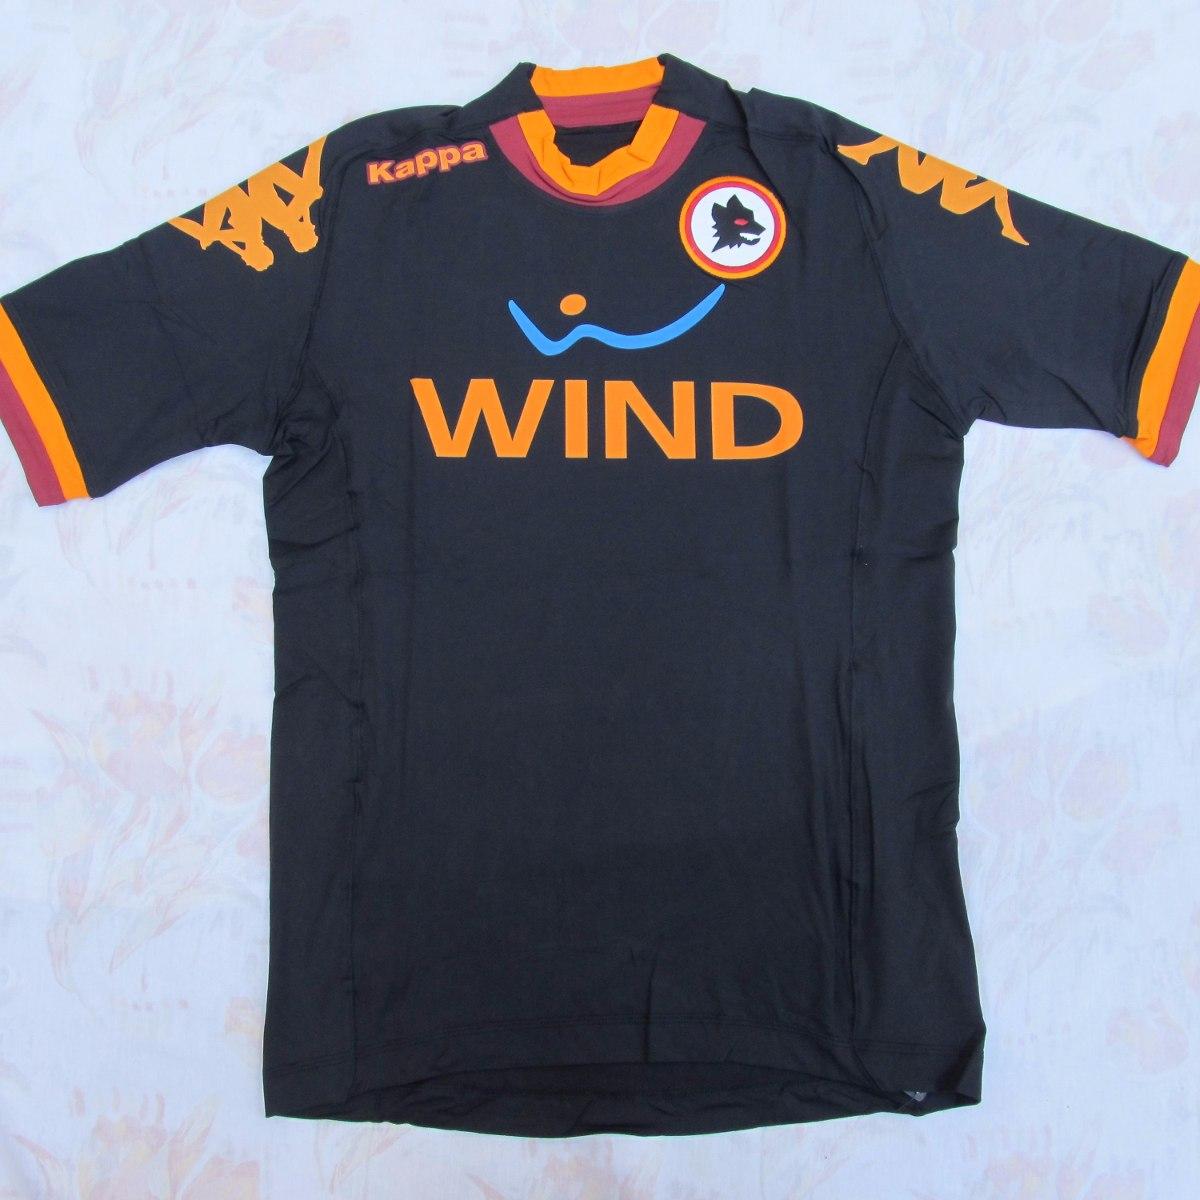 740c87600e 302pg80 Camisa Kappa Roma Third 12 13 G Jogador Fn1608 - R  1.499